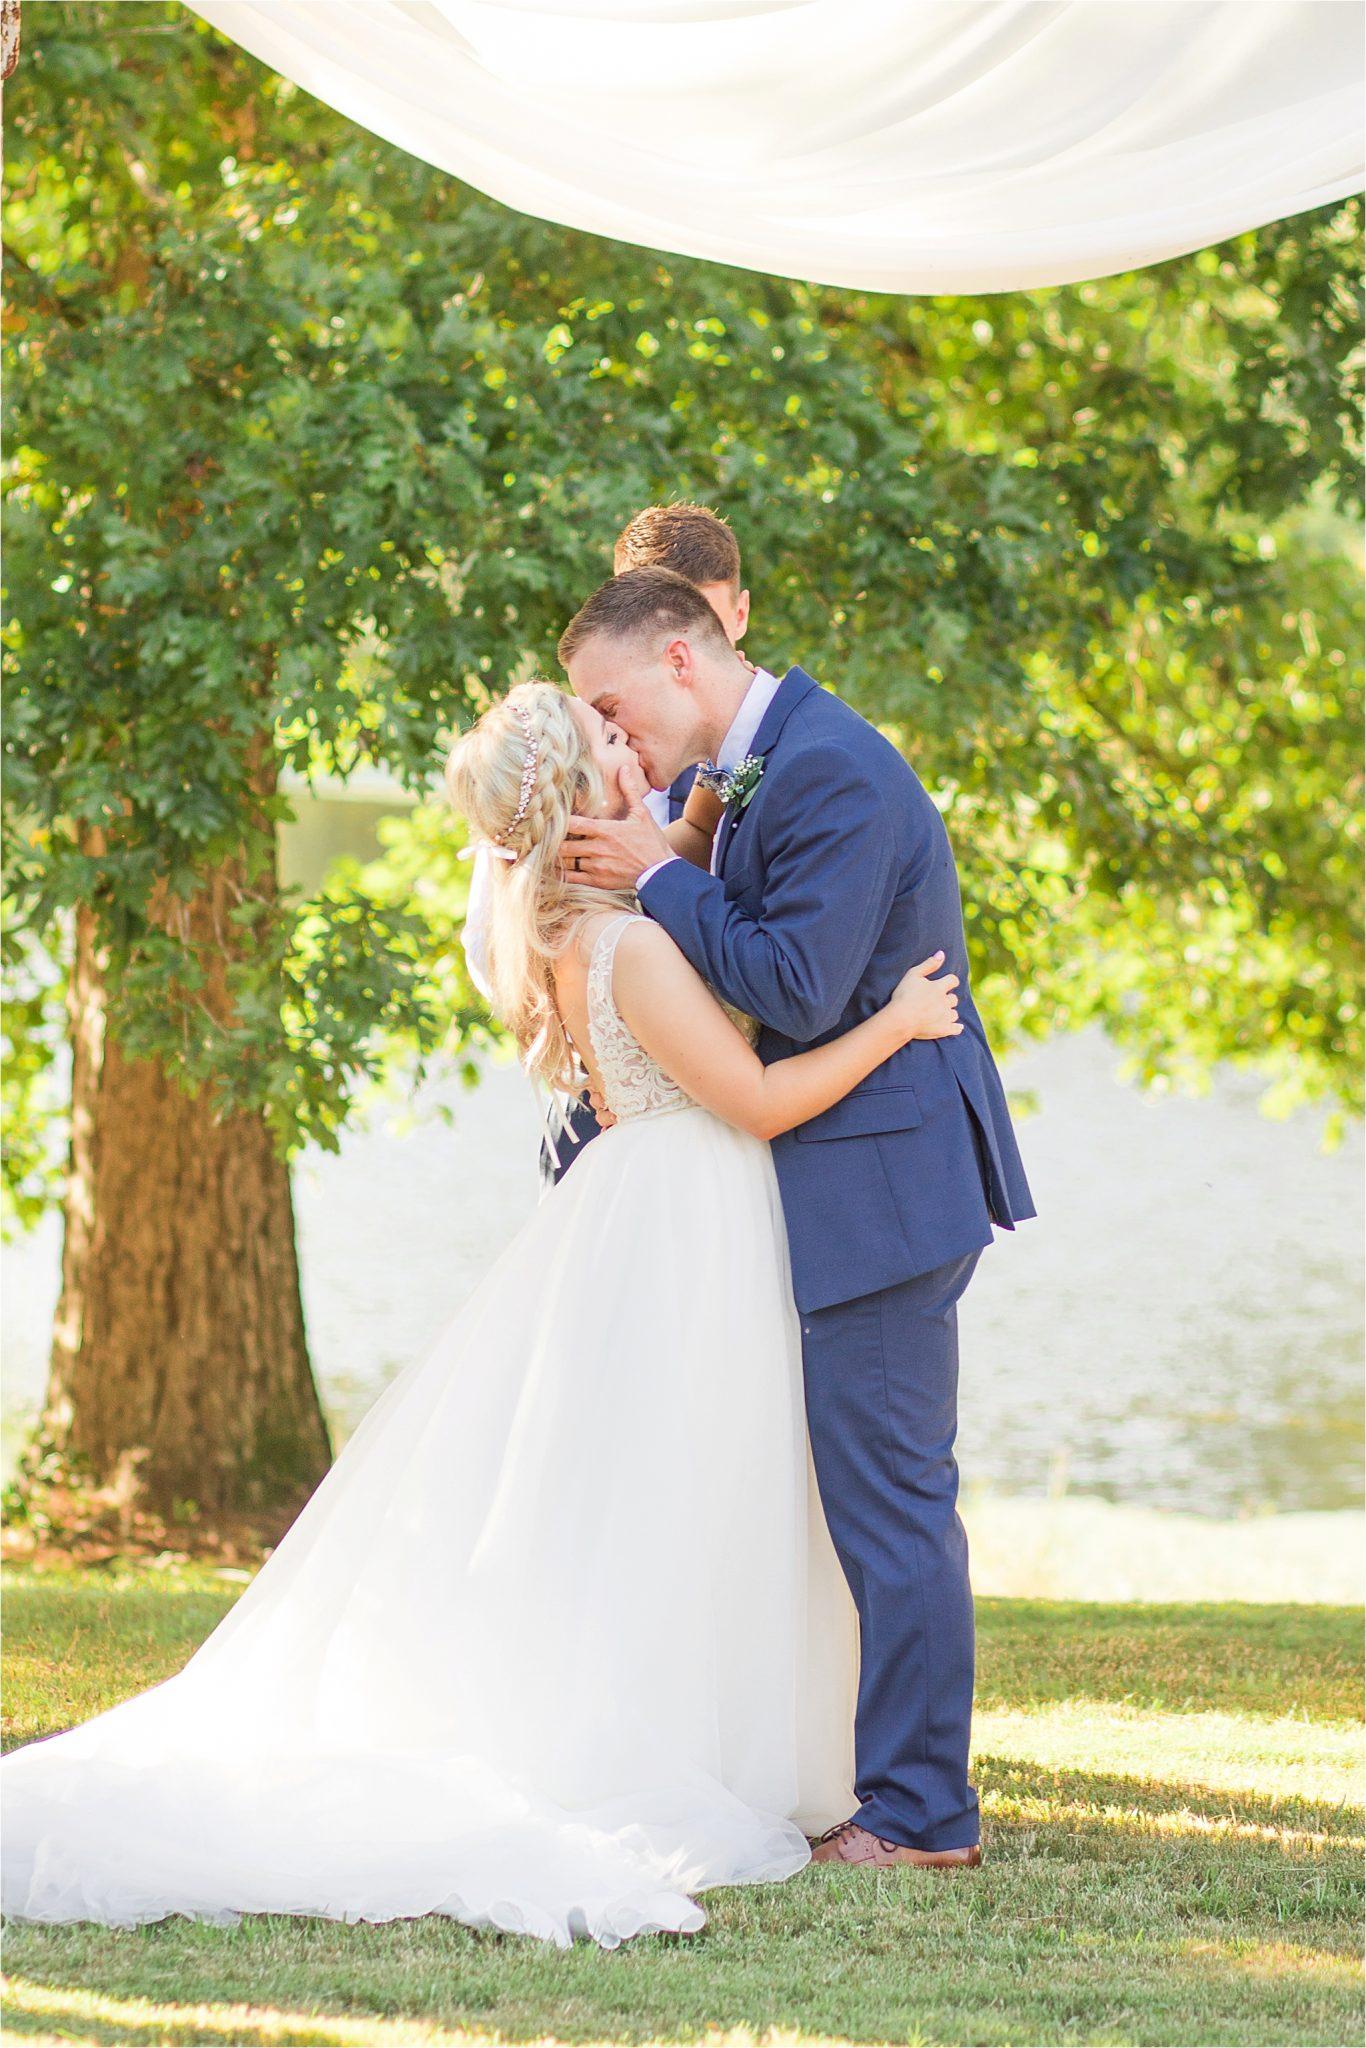 wedding-ceremony-alabama-wedding-photographer-blue-navy-first-kiss